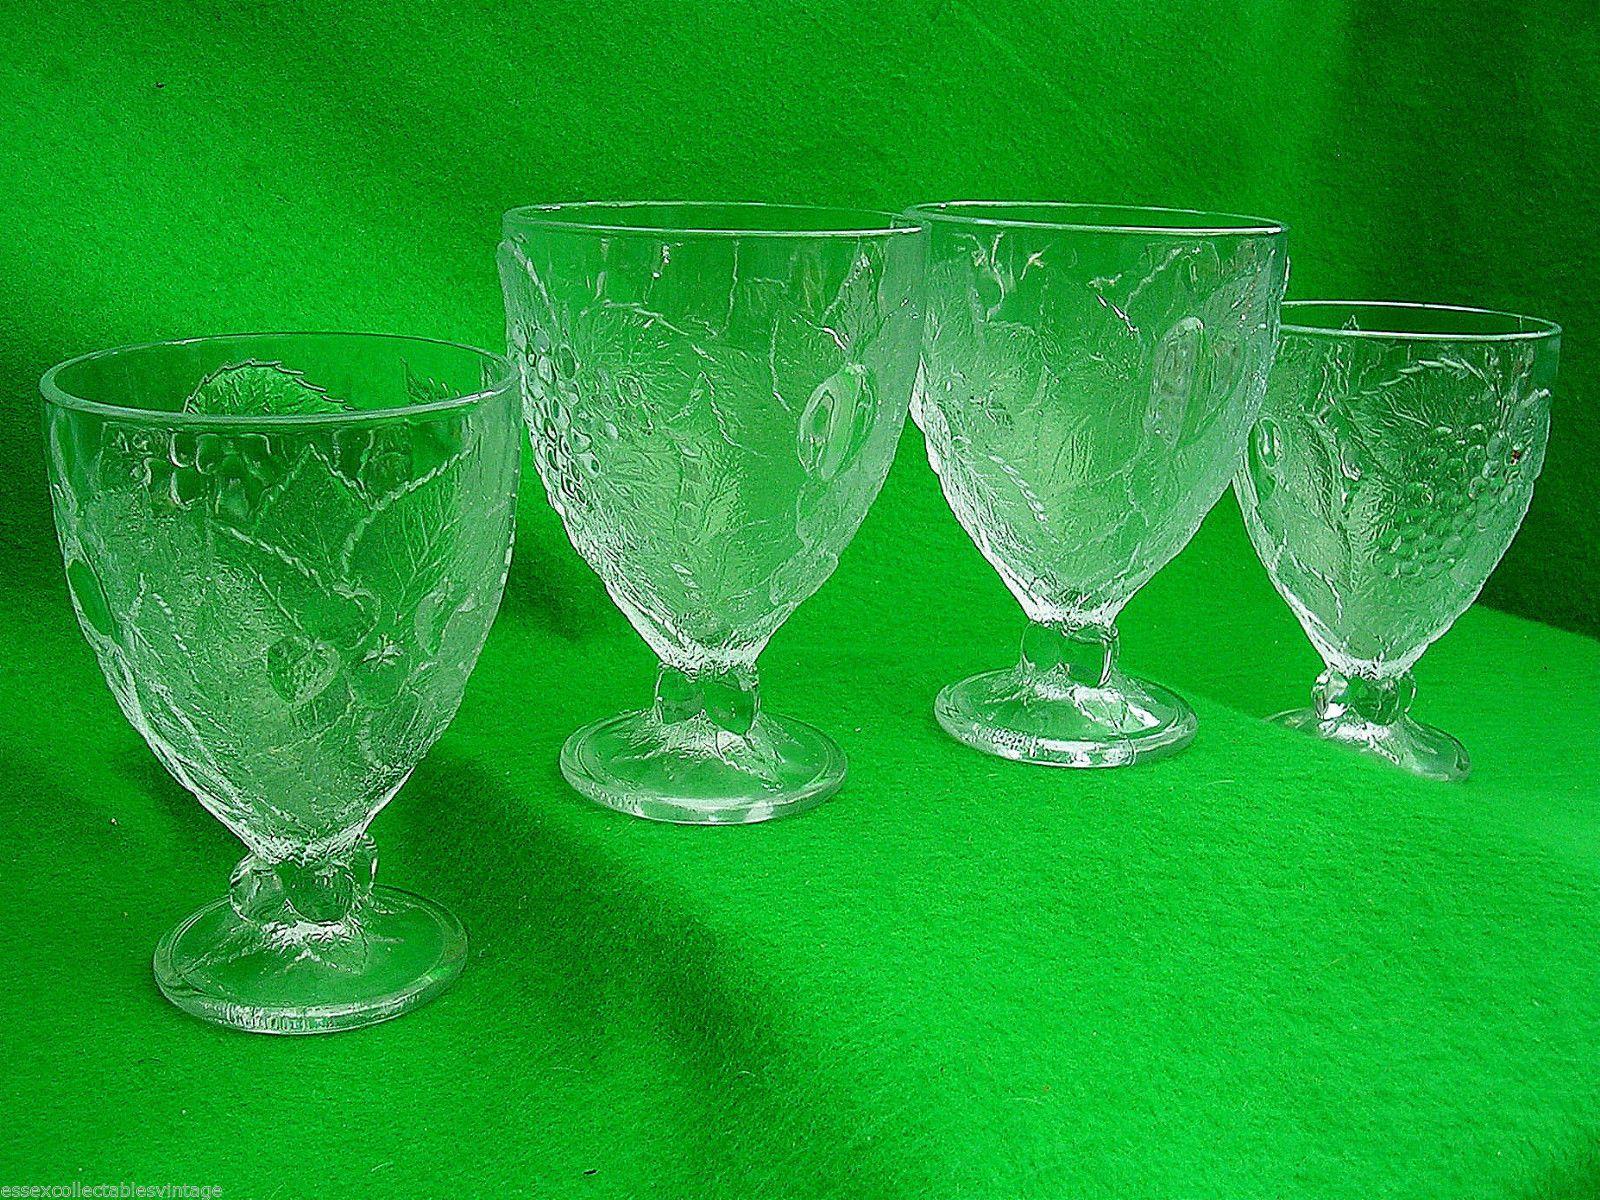 Retro Vintage Set 4 Glass Stemmed Dessert Sorbet Sundae Dishes Bowls Fruit | eBay